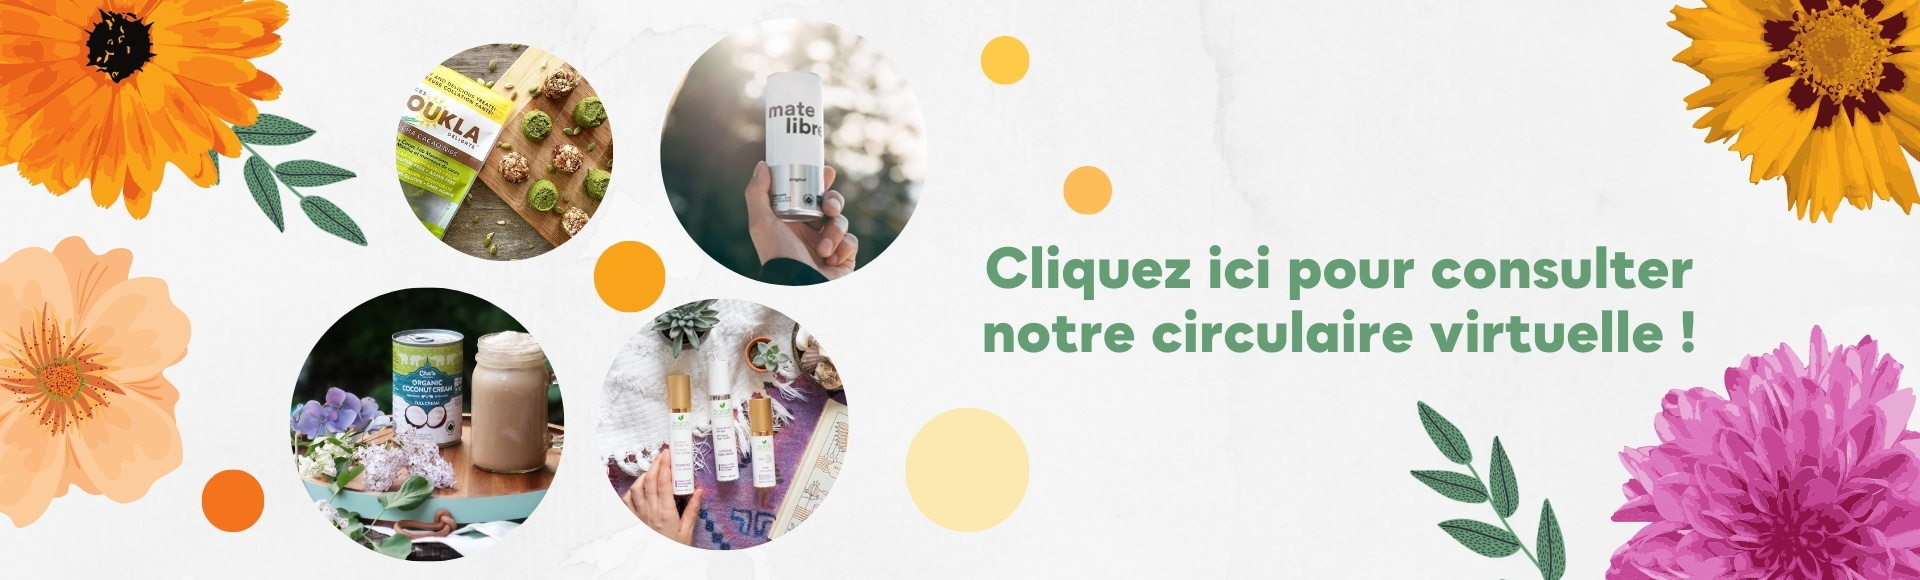 Eco-Boutique Un Monde A Vie